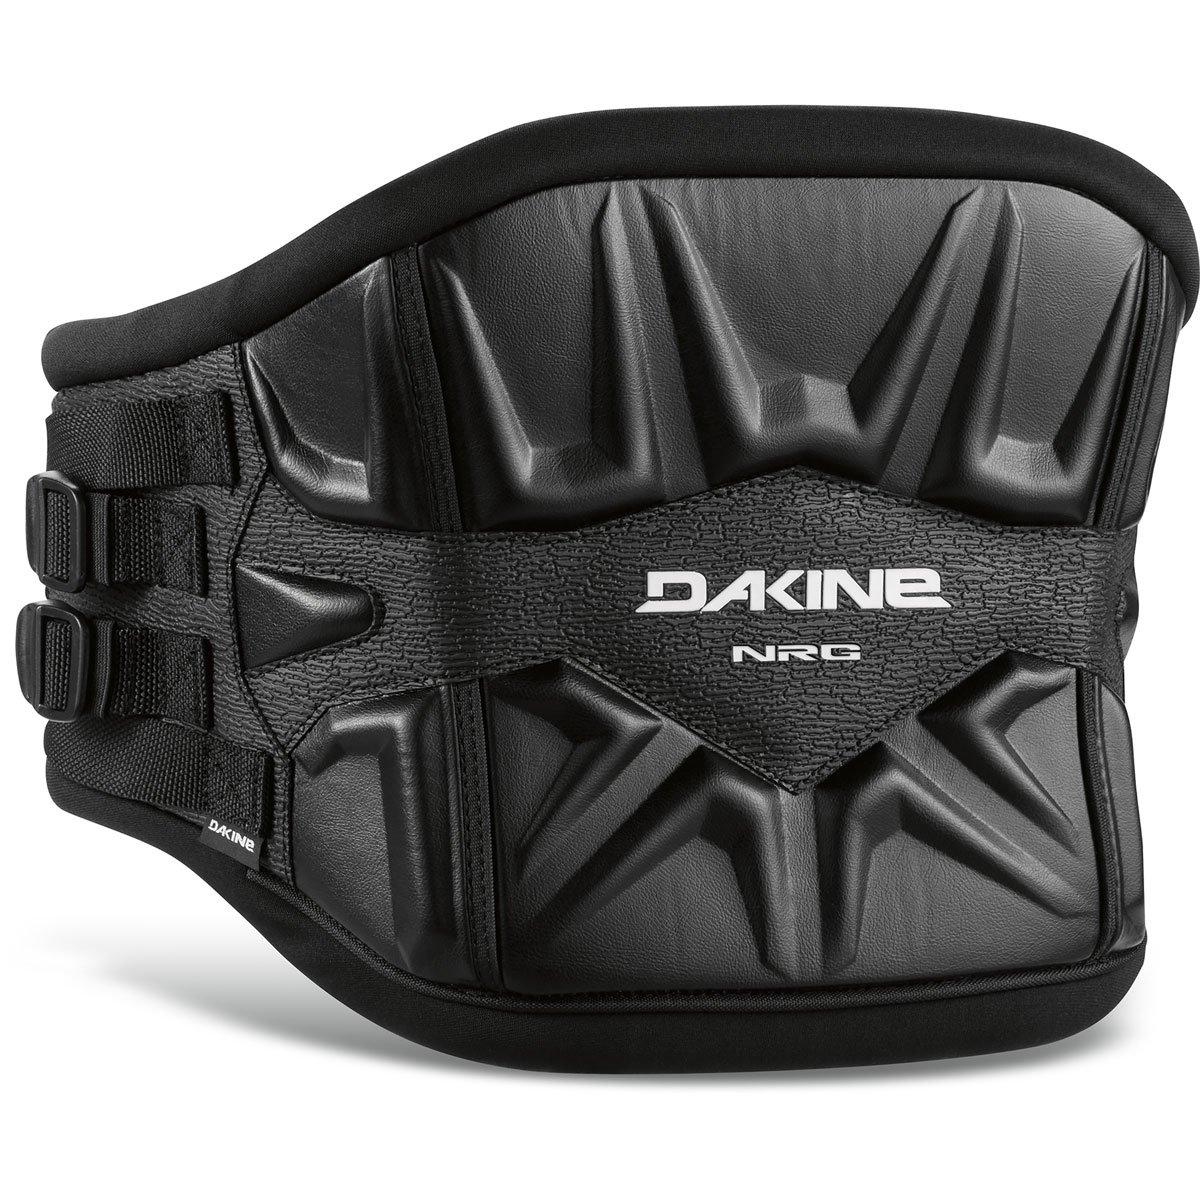 Dakine Men's Hybrid NRG Windsurf Harness, Black, S by Dakine